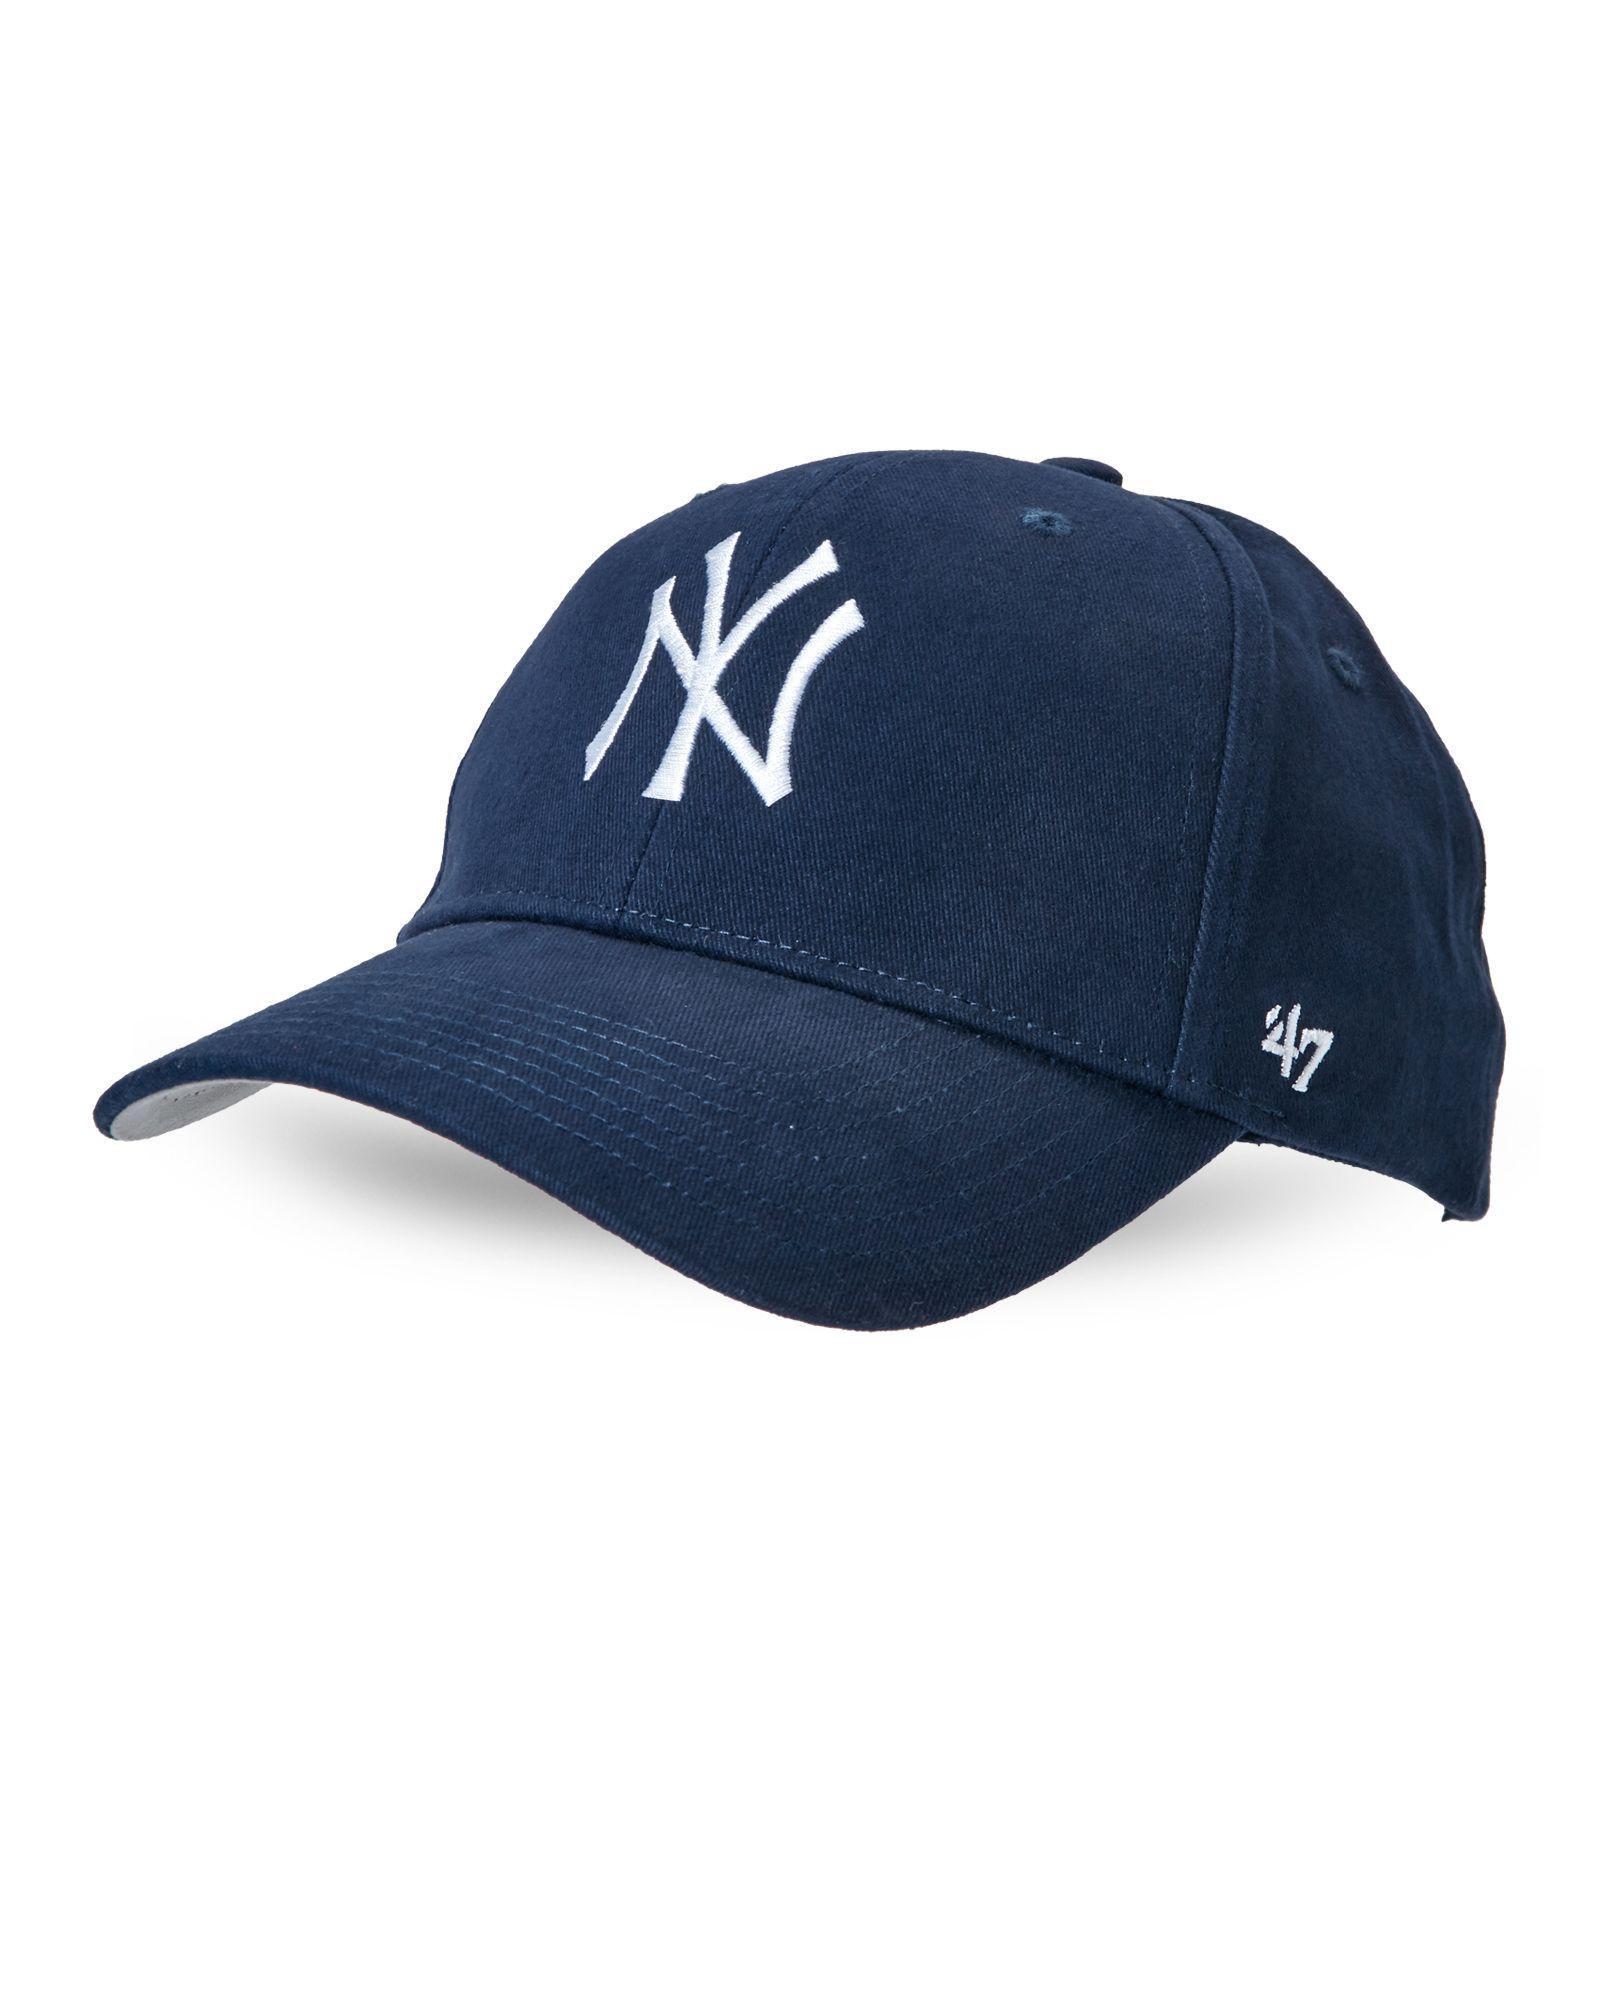 5c534a34c0e217 ... best price boys 4 7 new york yankees baseball cap baseball cap and cap  abc4c 35d94